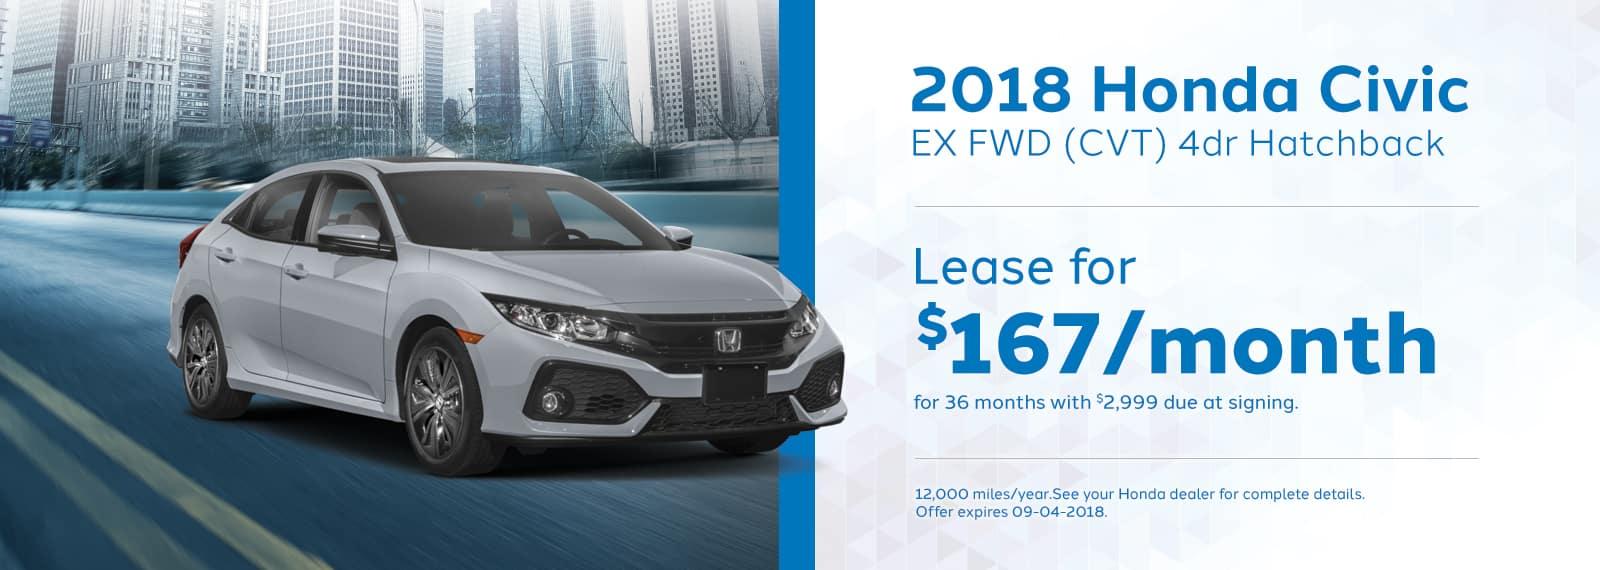 Civic EX Genthe Honda Lease special